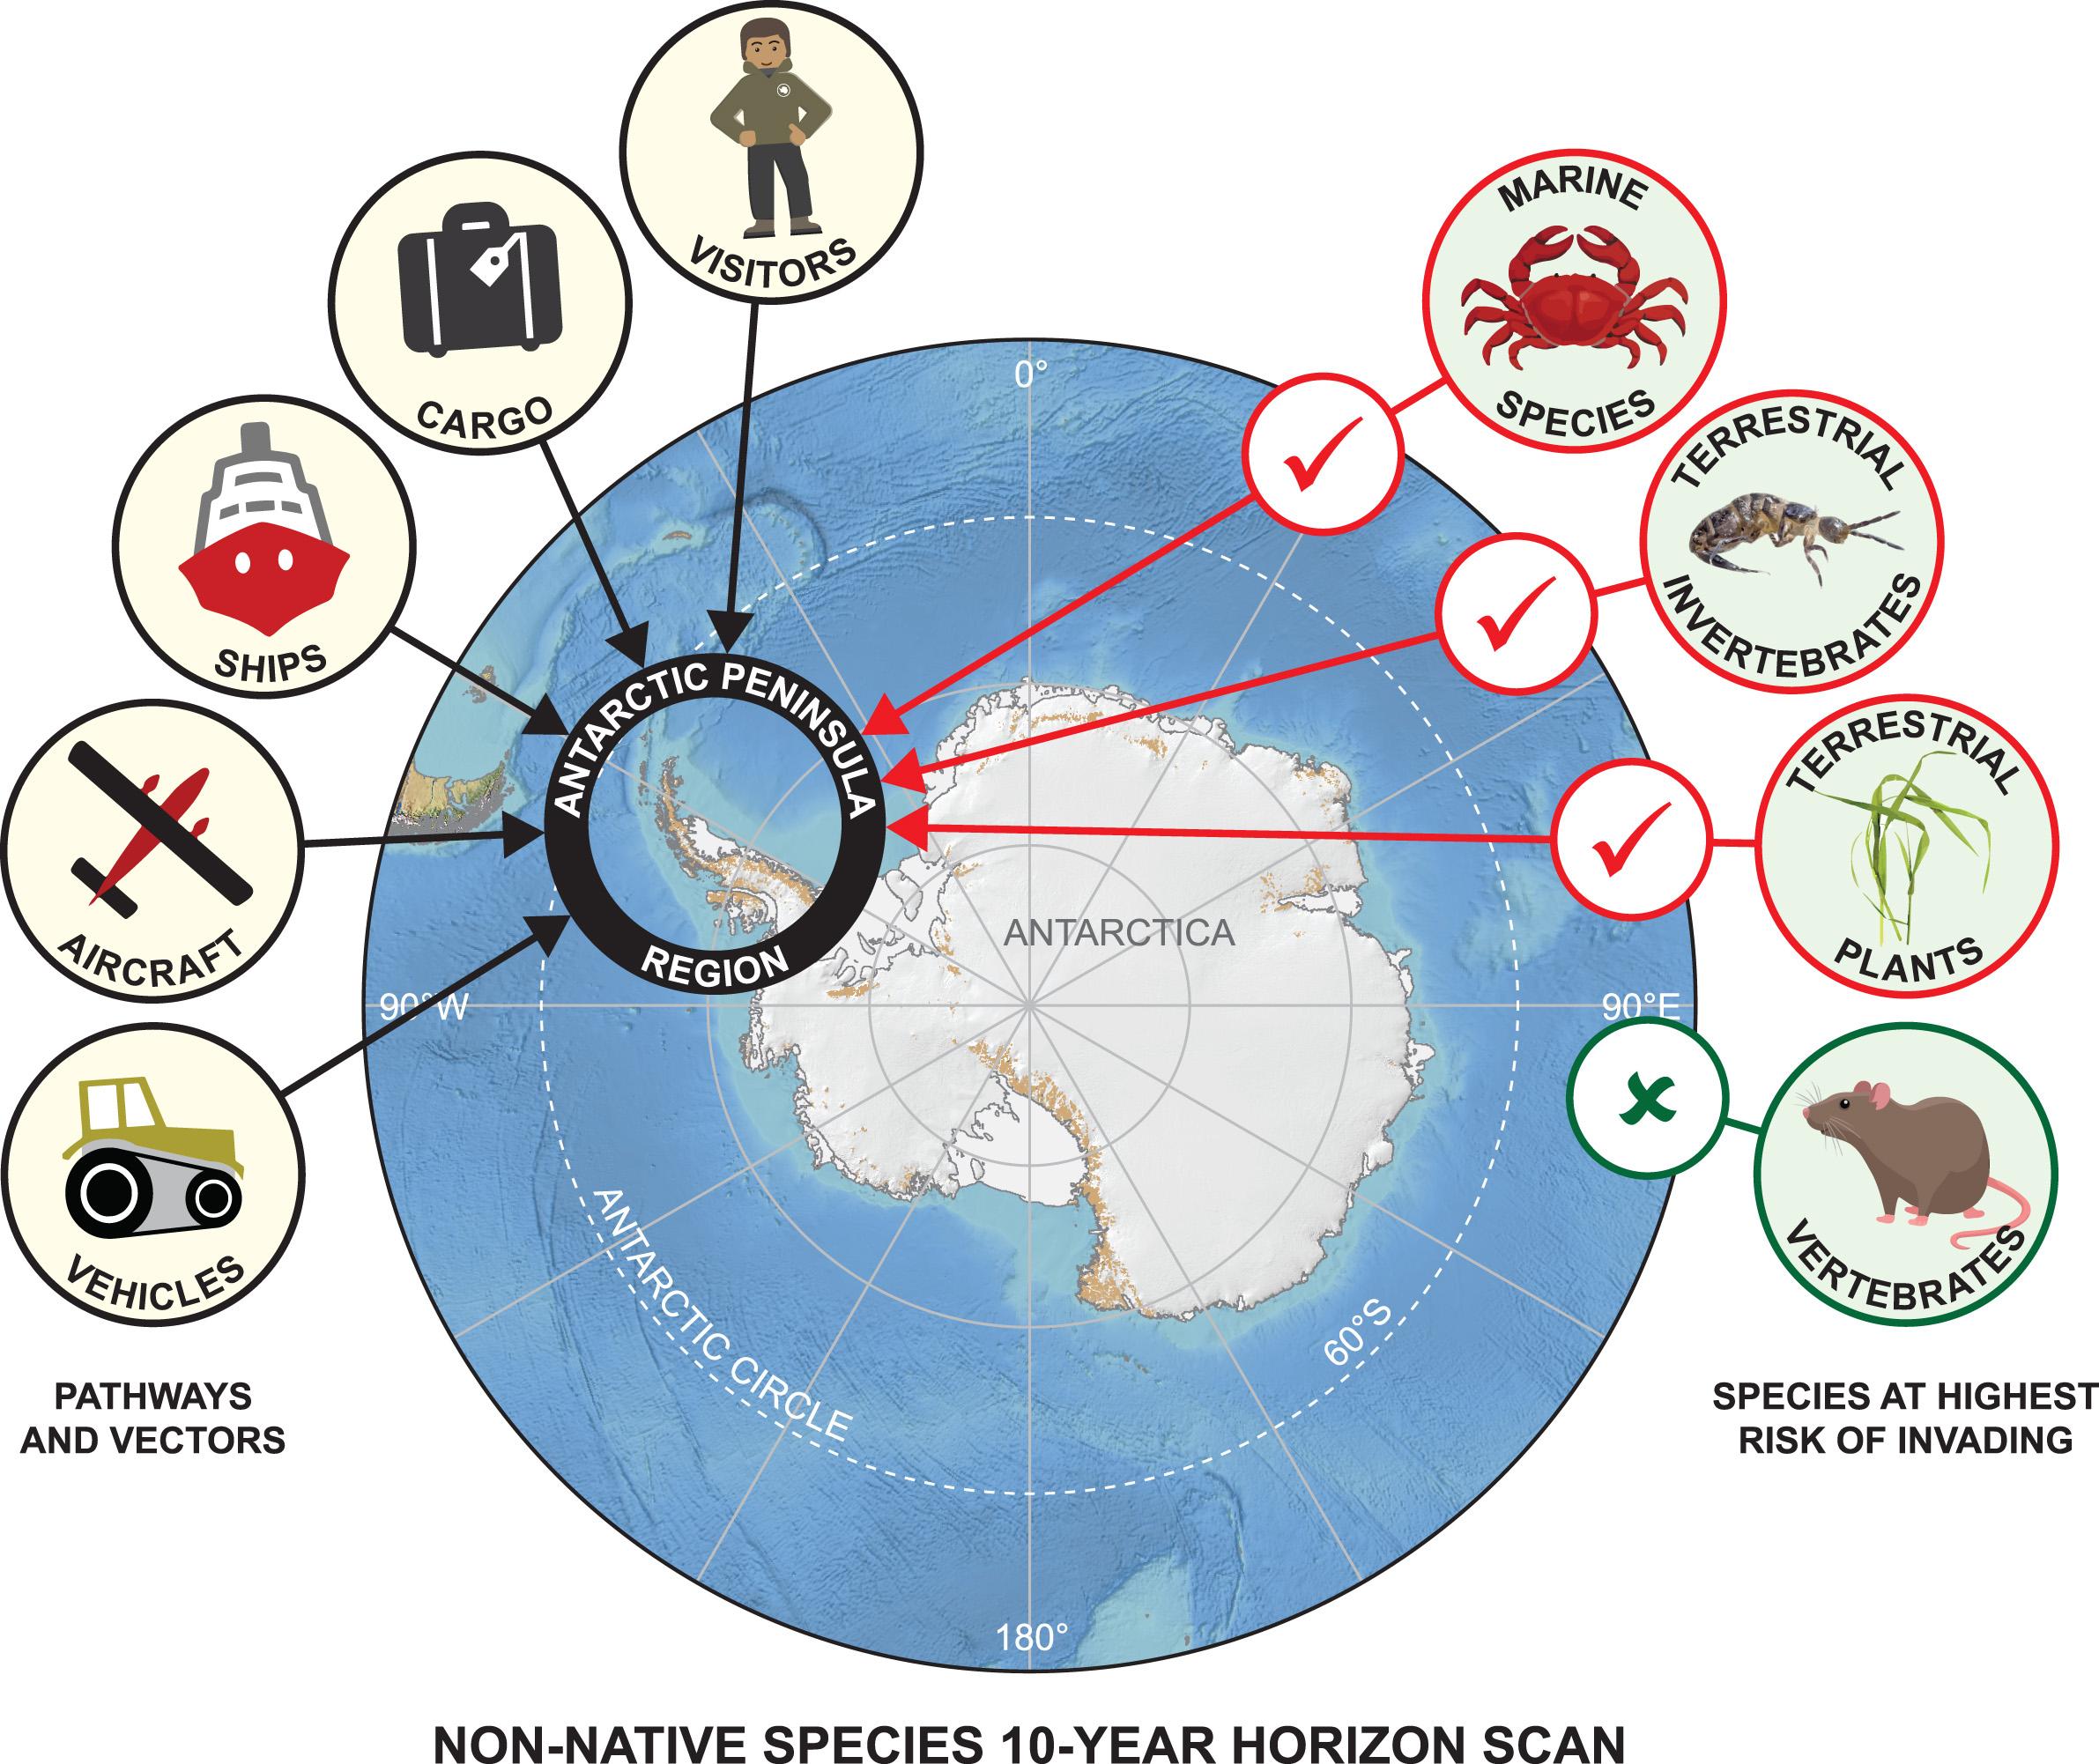 Invasive species posing threat to Antarctica